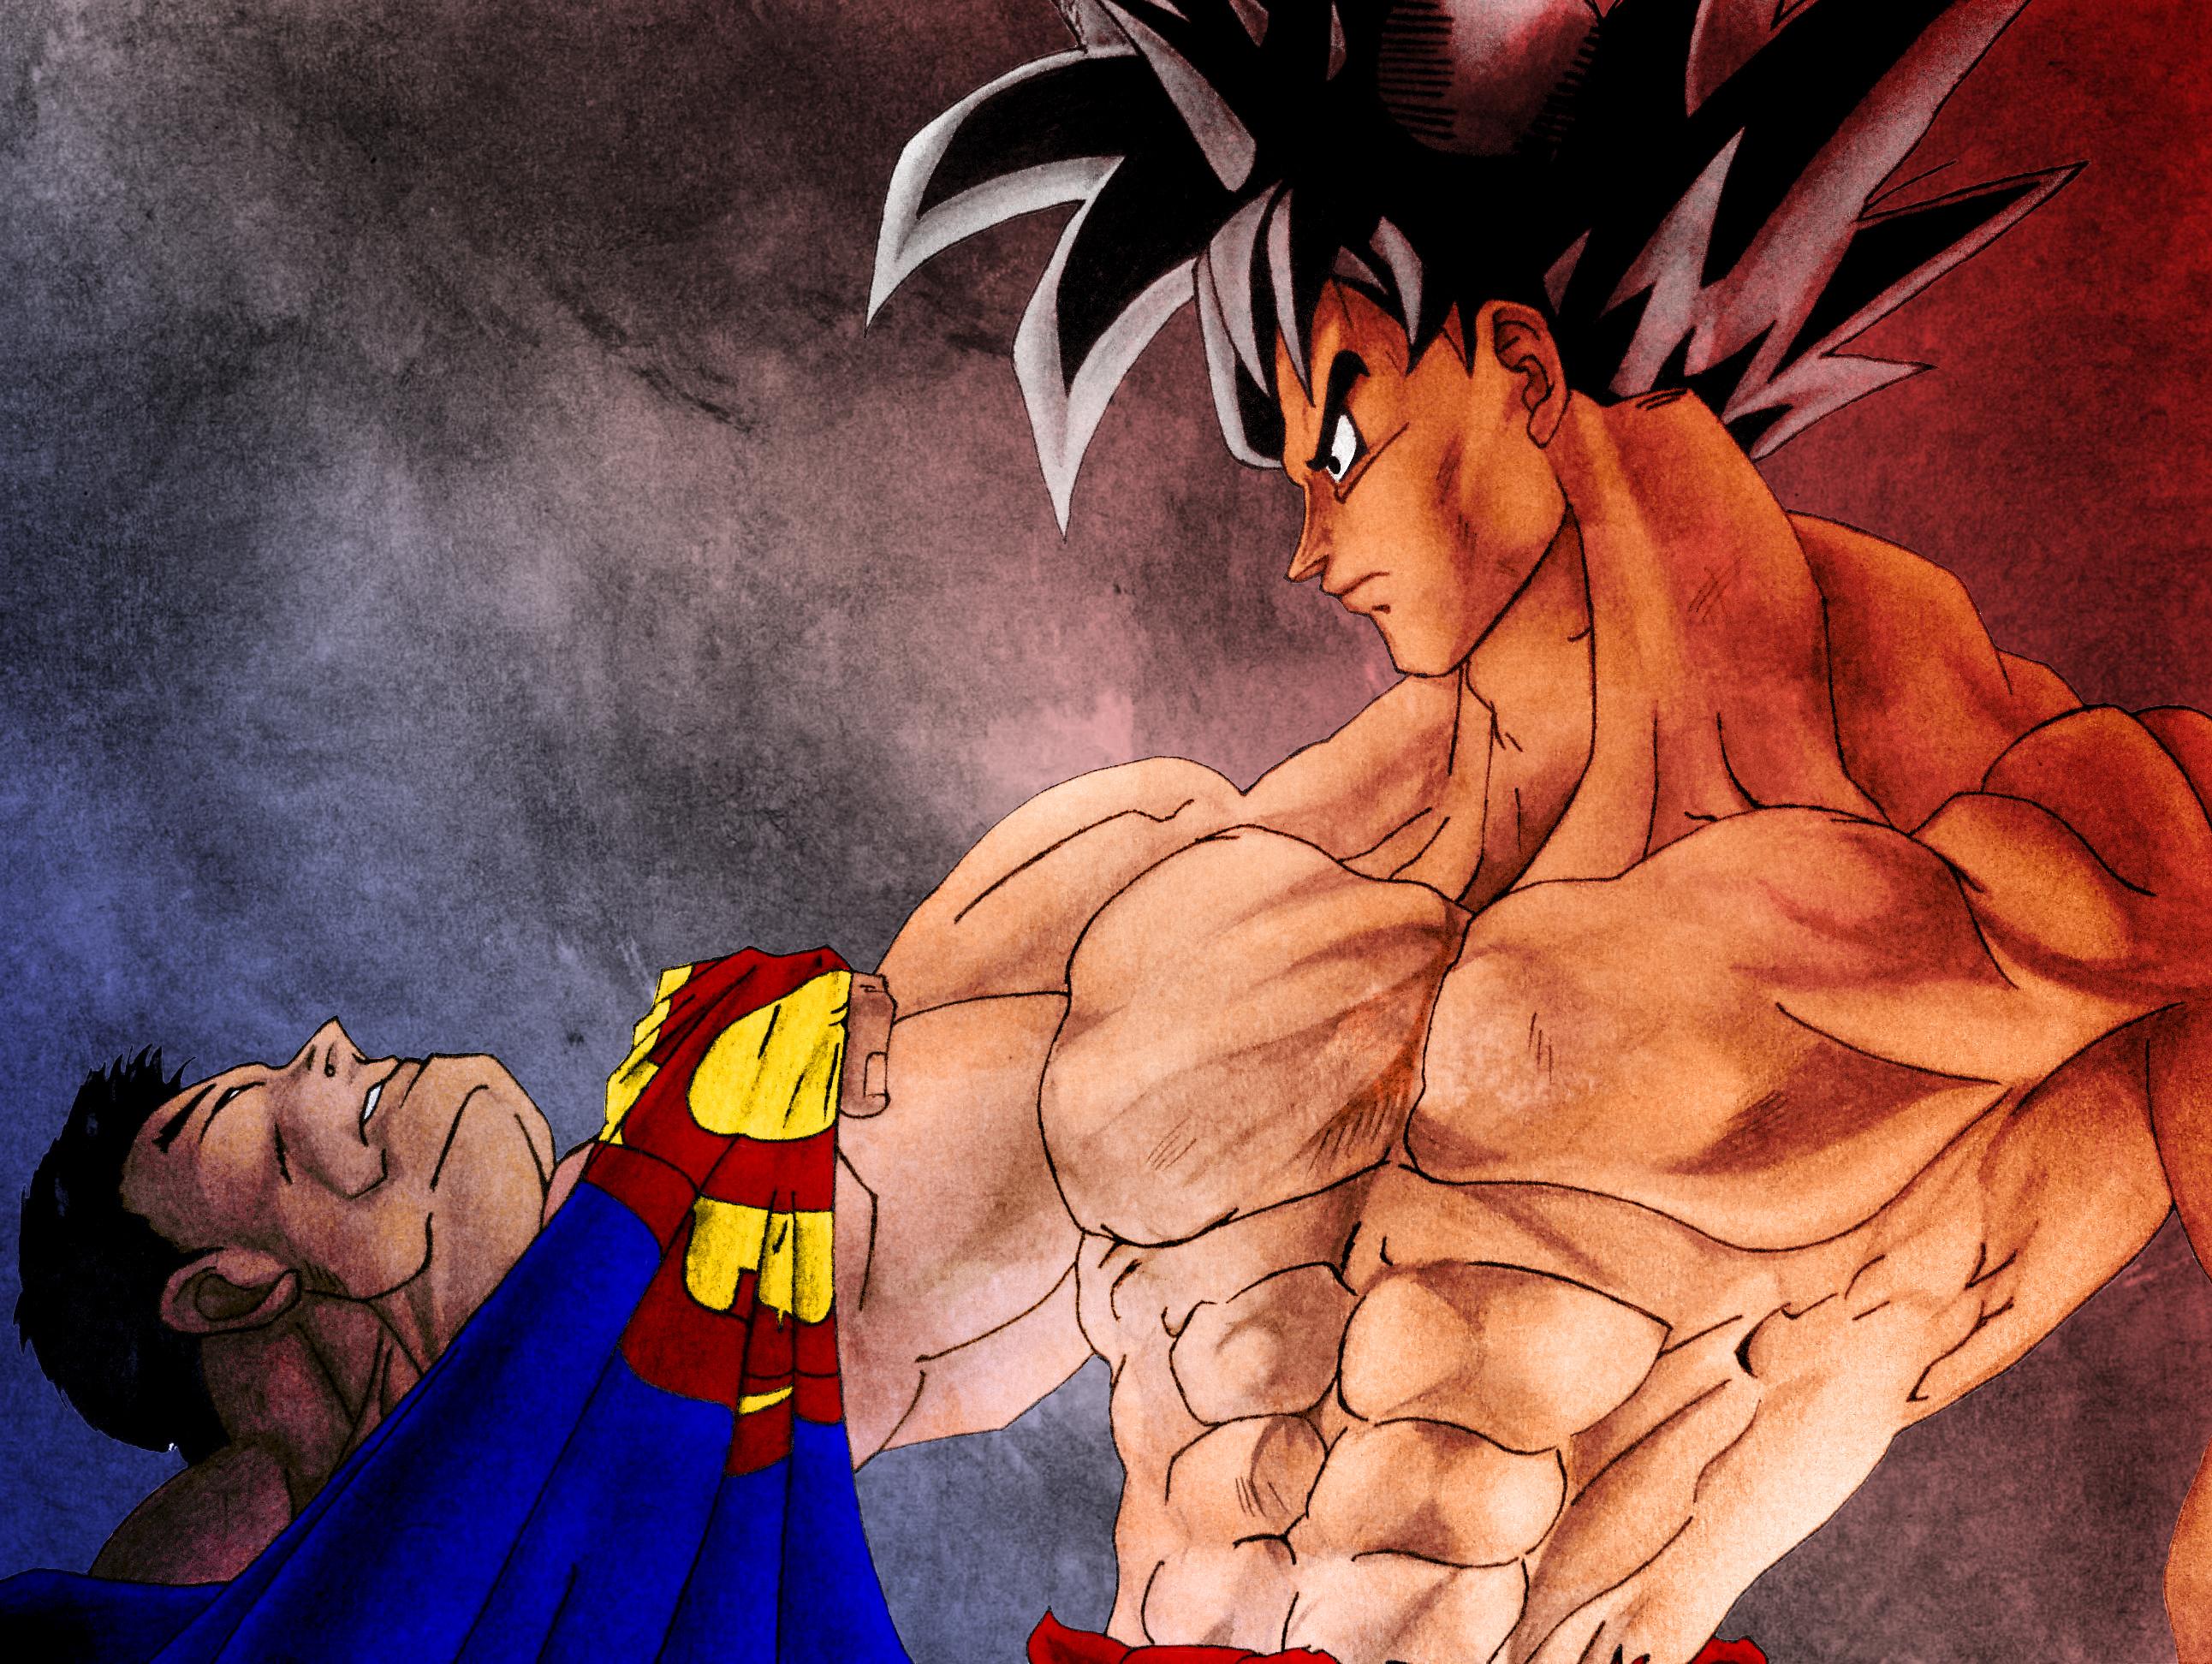 http://orig03.deviantart.net/c3b4/f/2013/233/f/4/goku_vs_superman_by_vsbrick-d6j4u24.jpg